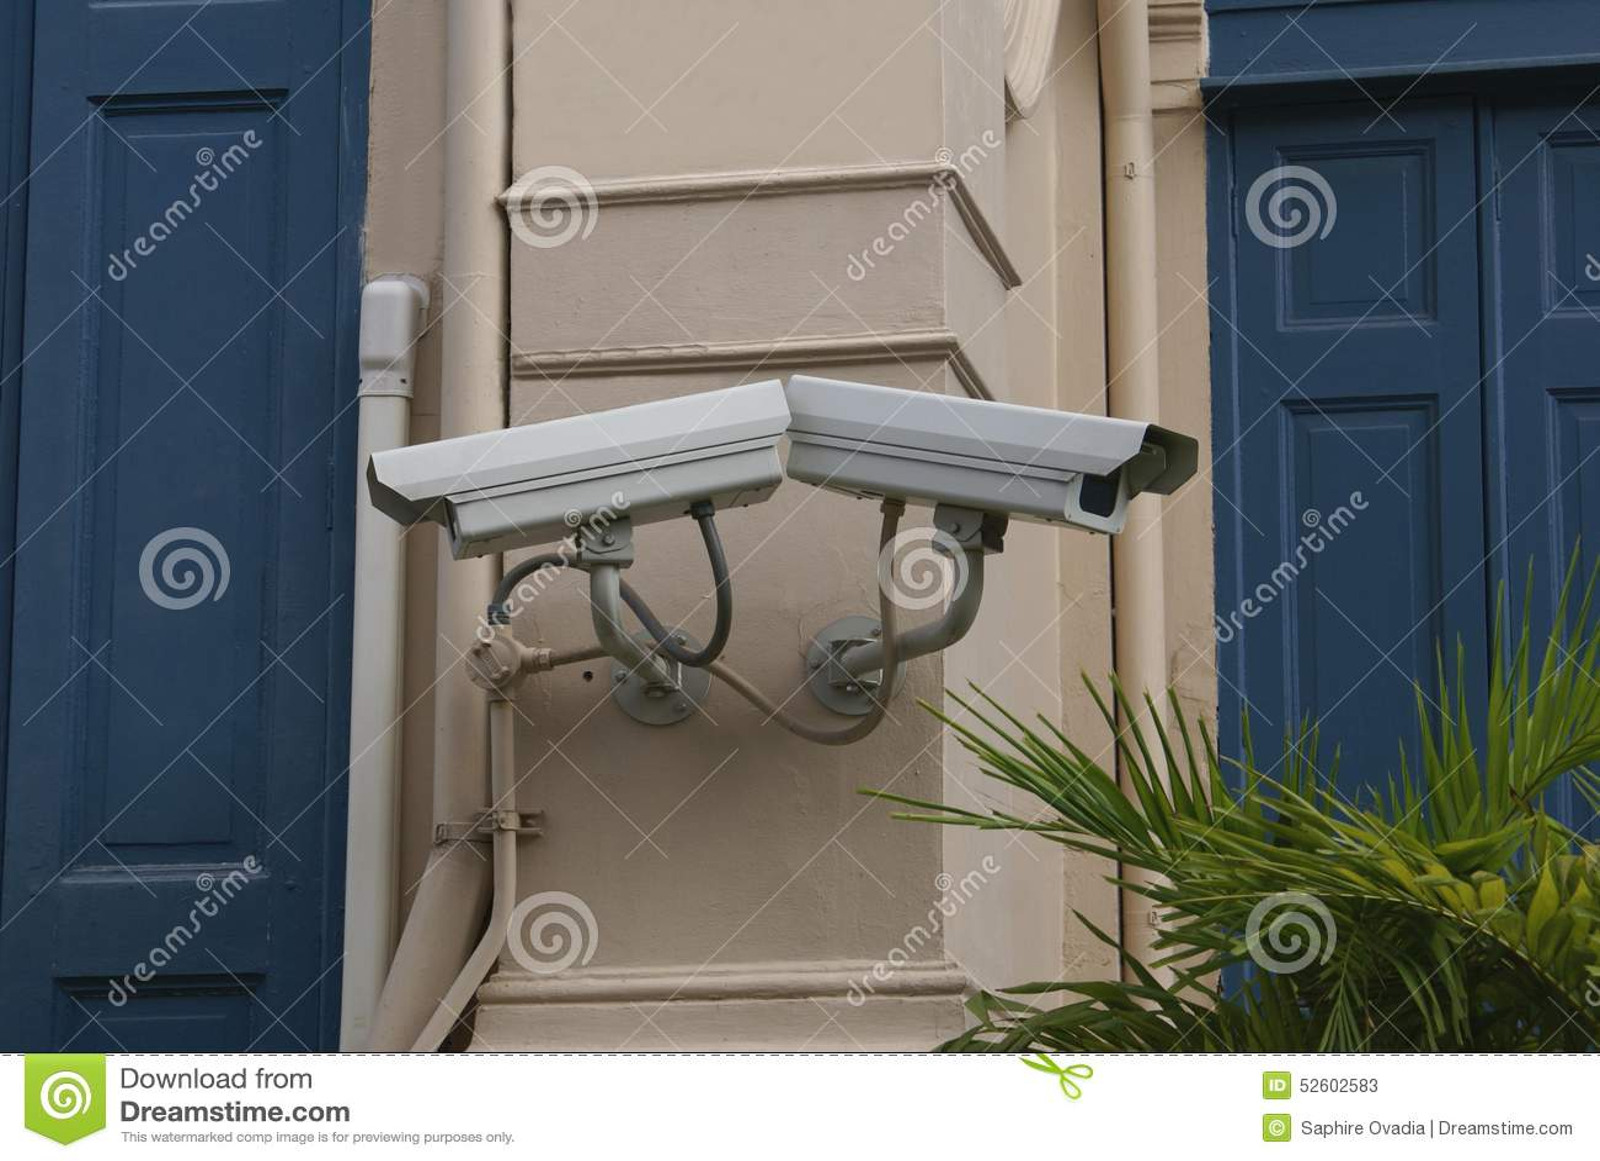 cctv cameras surveillance video cameras stock image. Black Bedroom Furniture Sets. Home Design Ideas